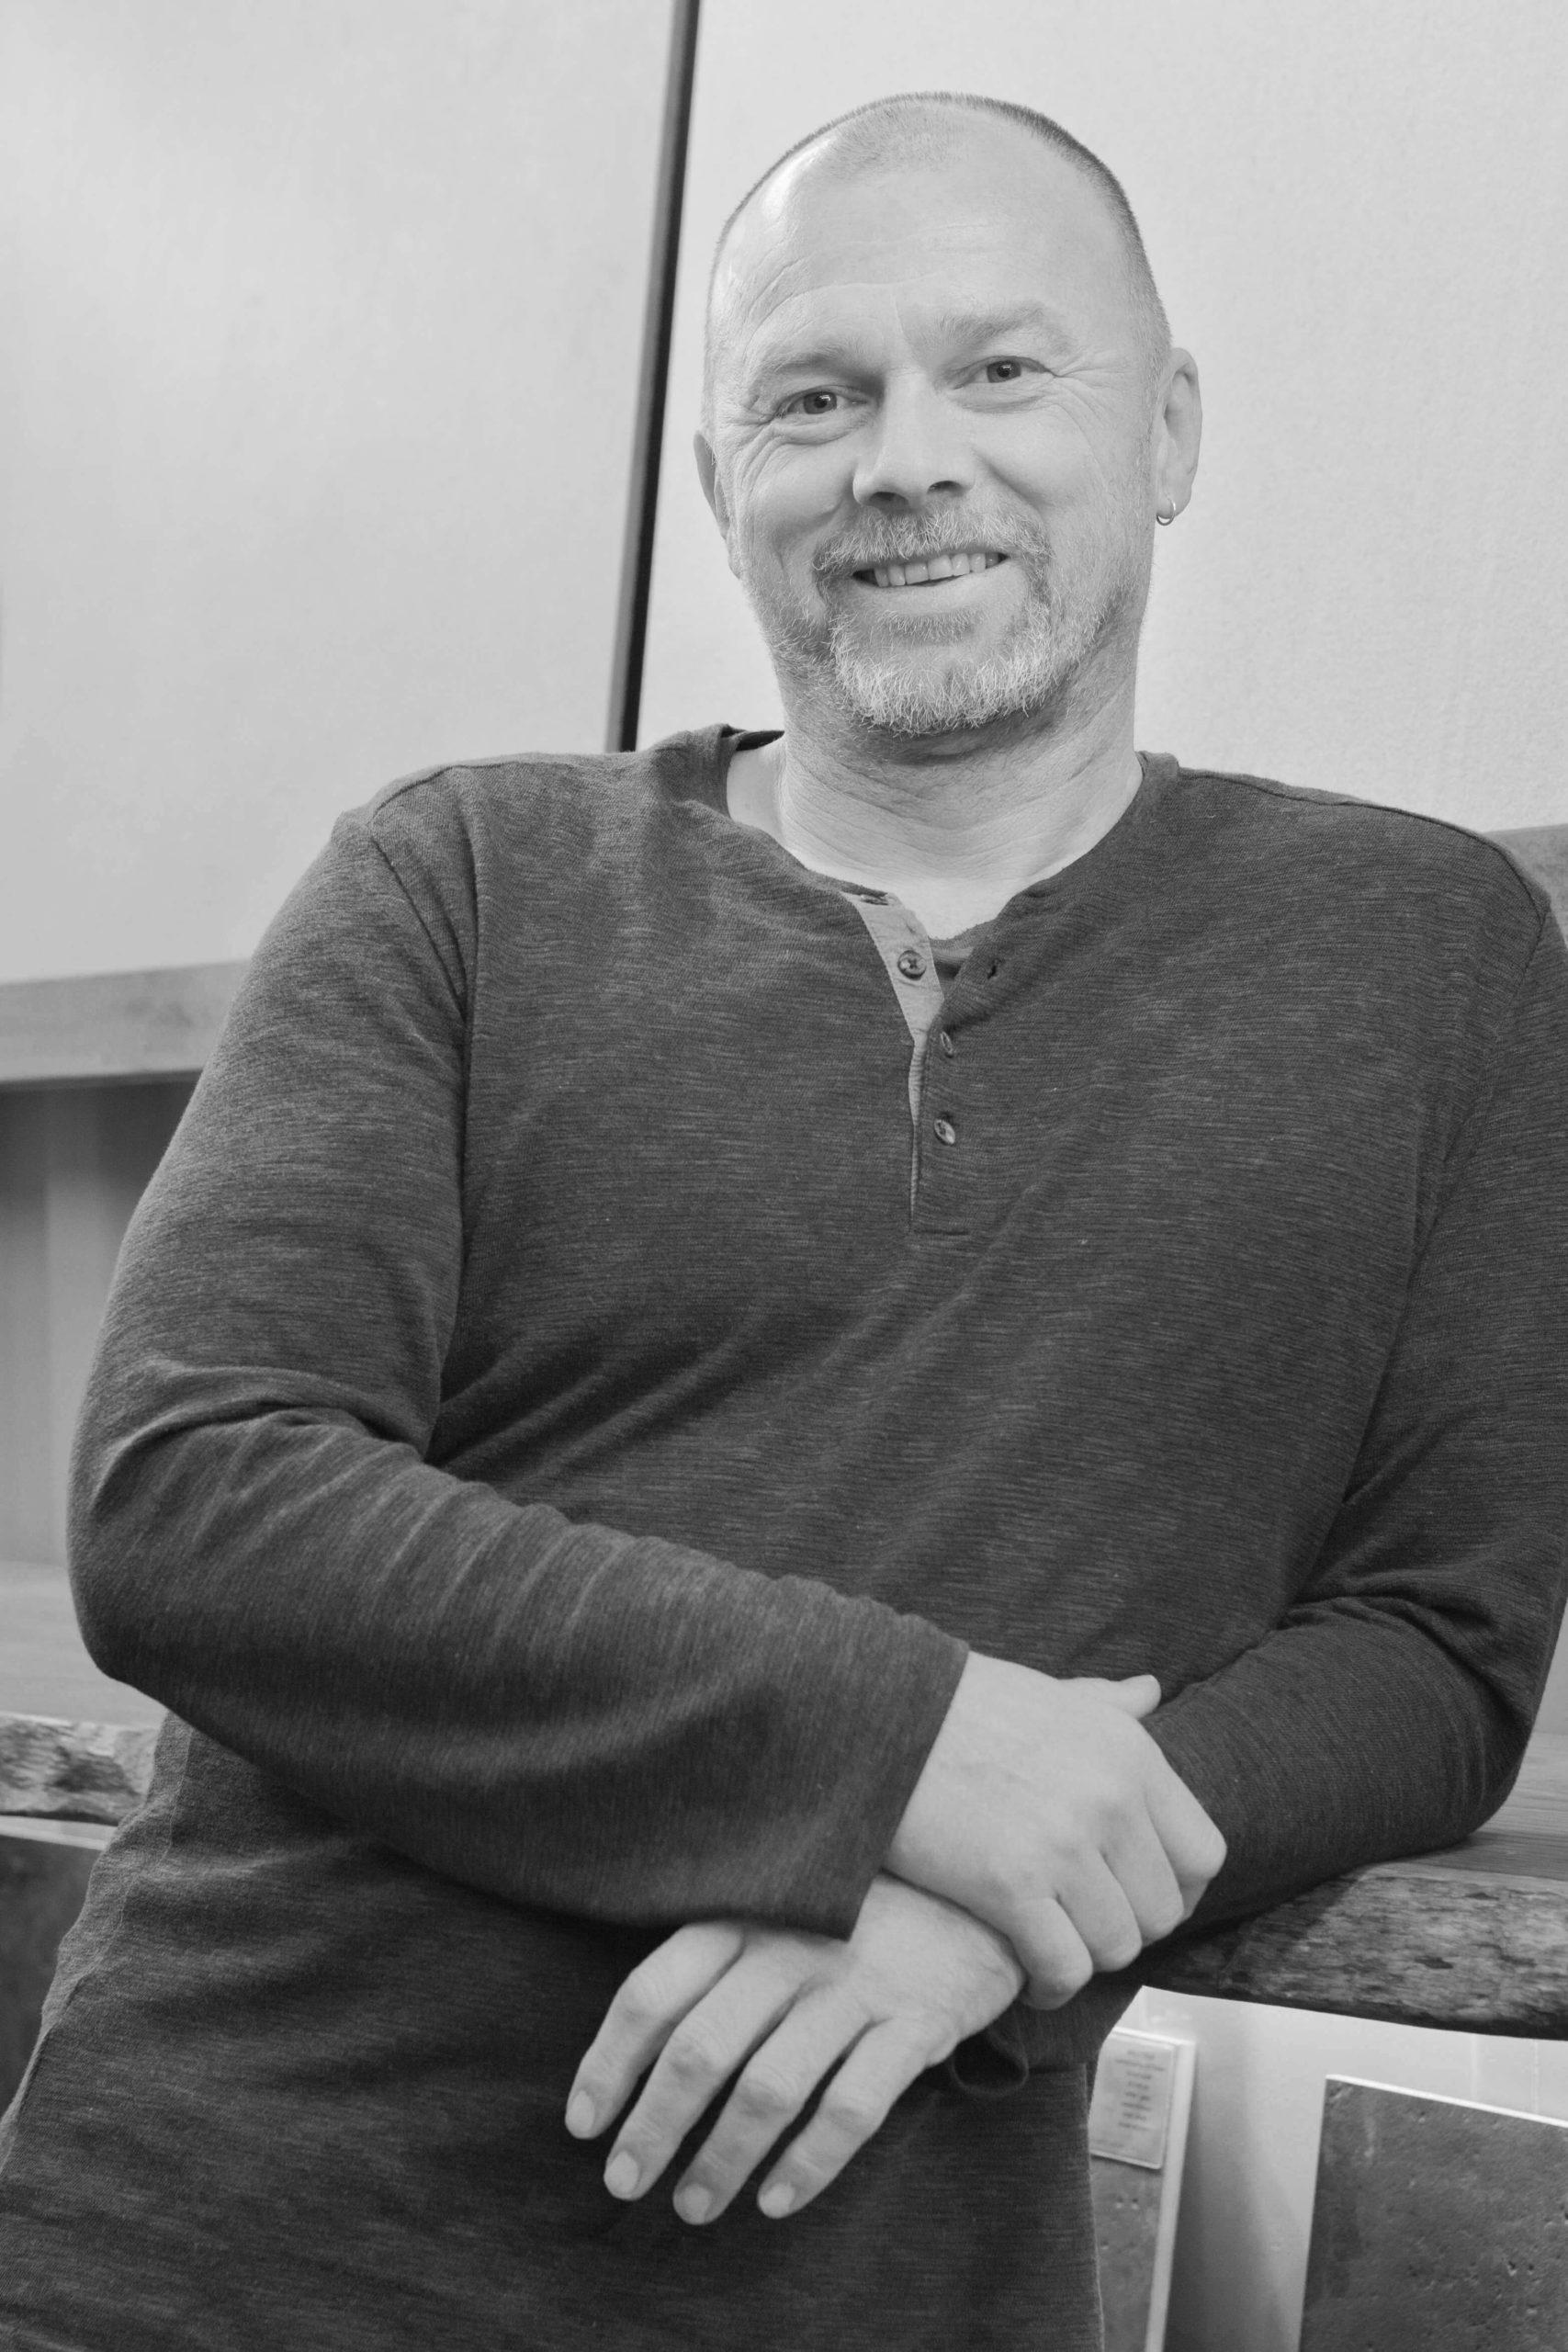 Walter Riedmeier - ARTIS kreativ Au i.d. Hallertau